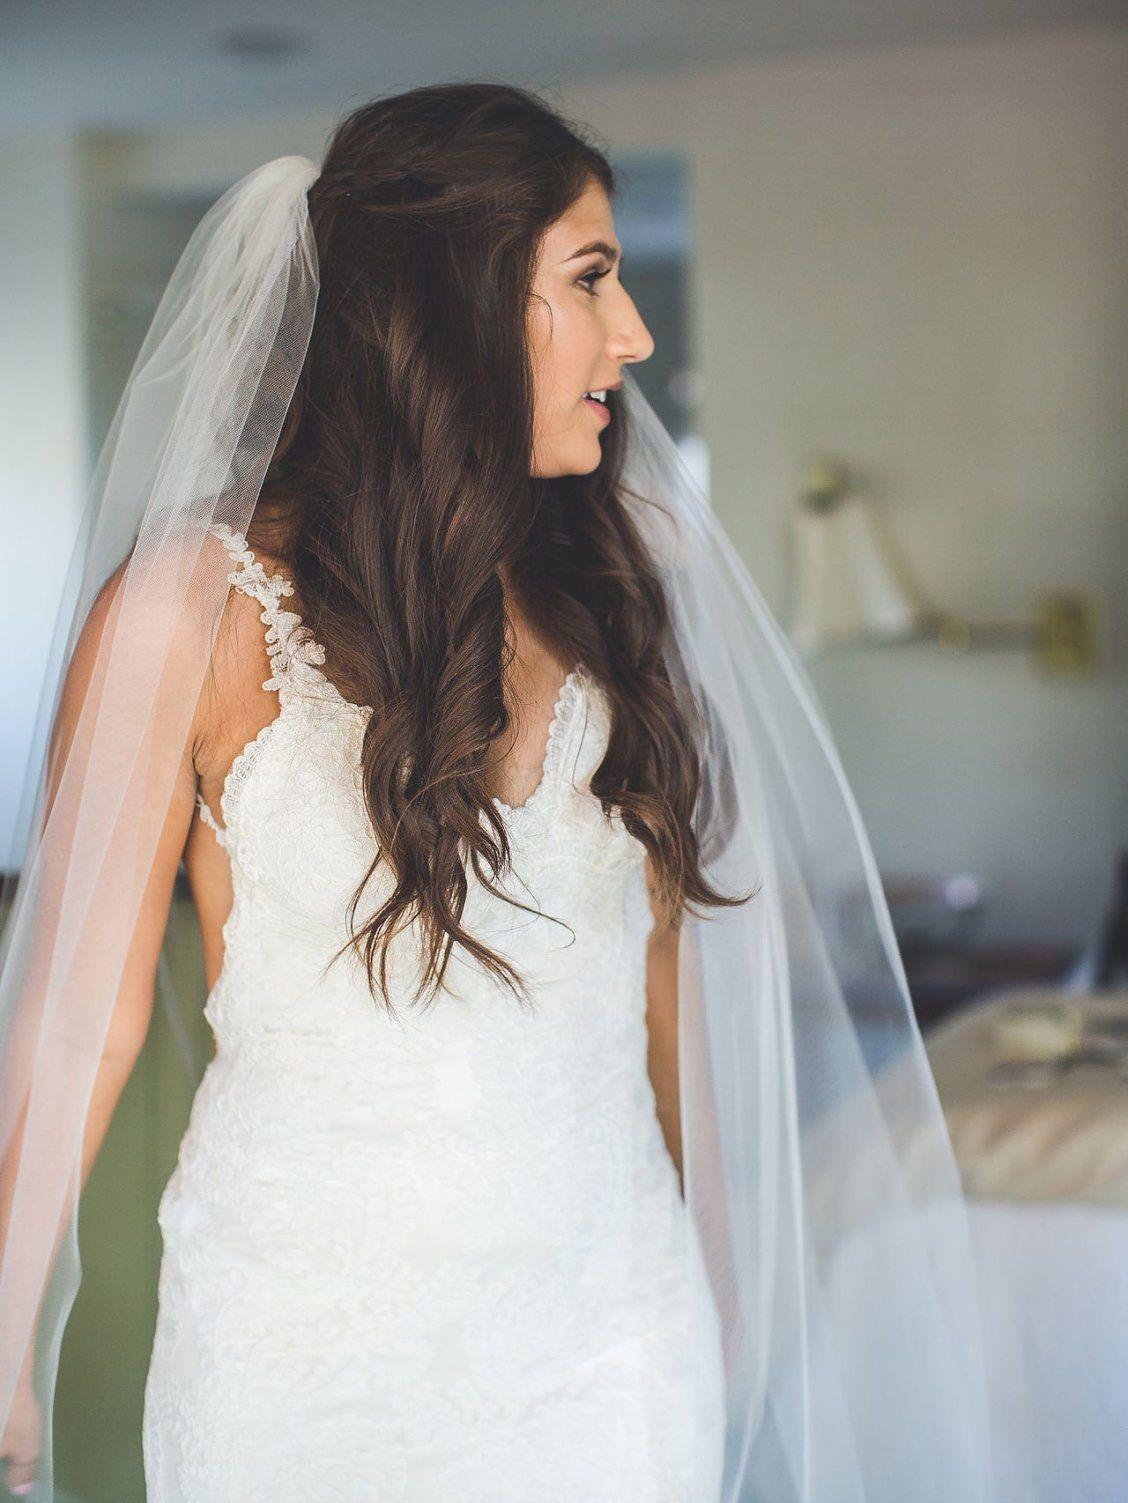 halfup wedding hairstyles with braids future mrs crabtree